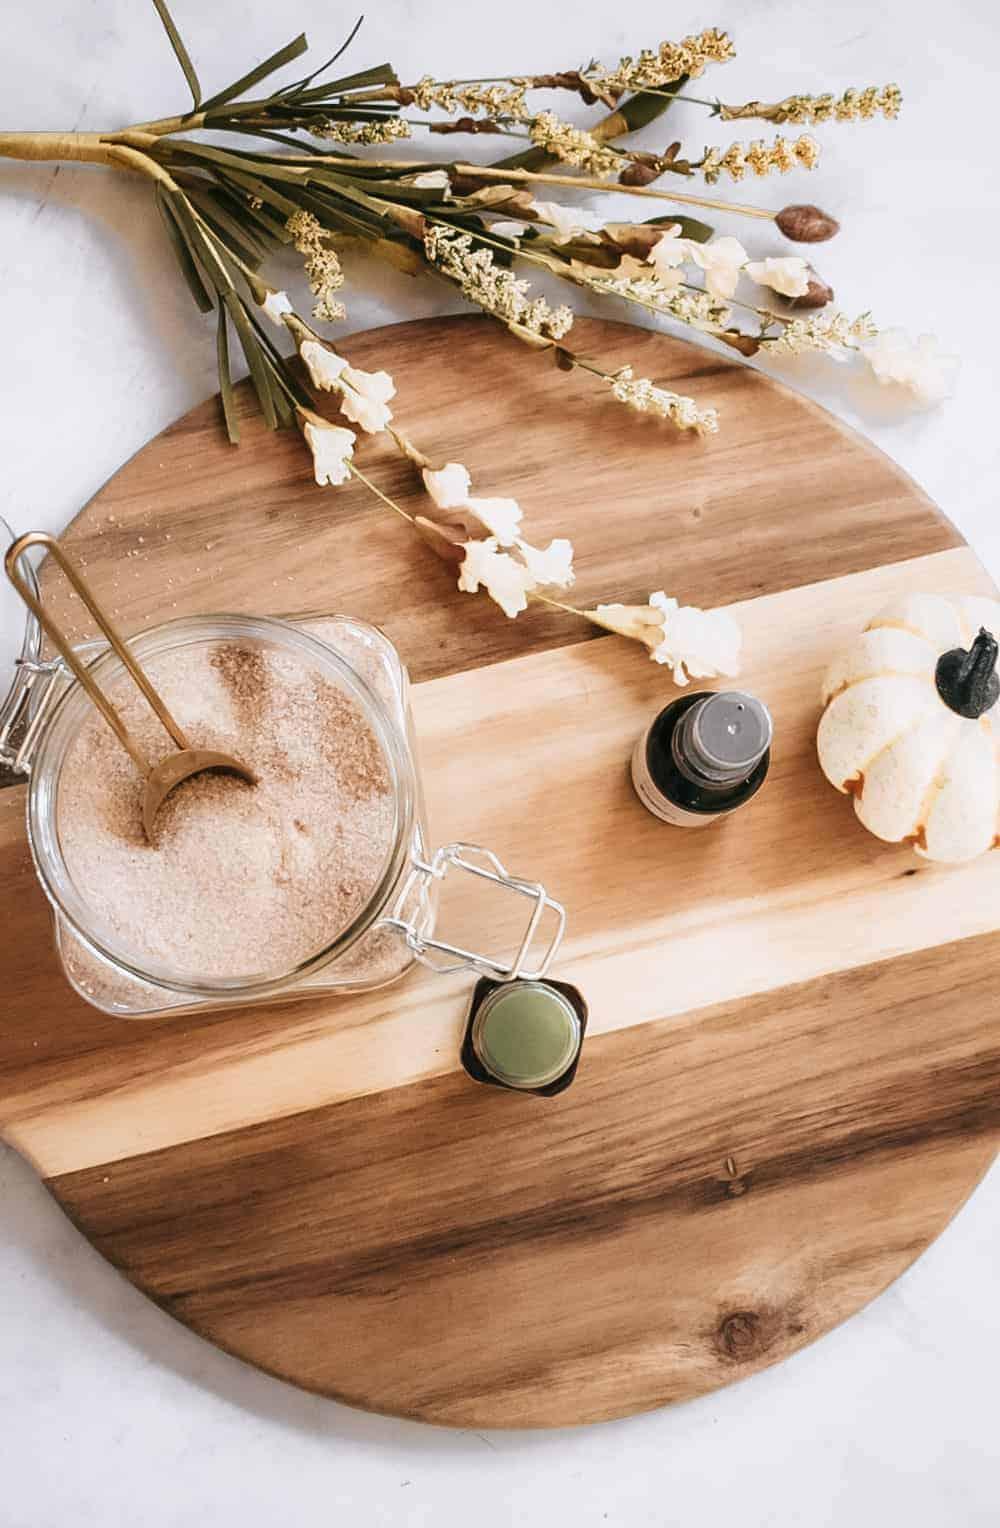 ingredients for diy pumpkin spice body scrub on round cutting board next to fall foliage and fake pumpkin